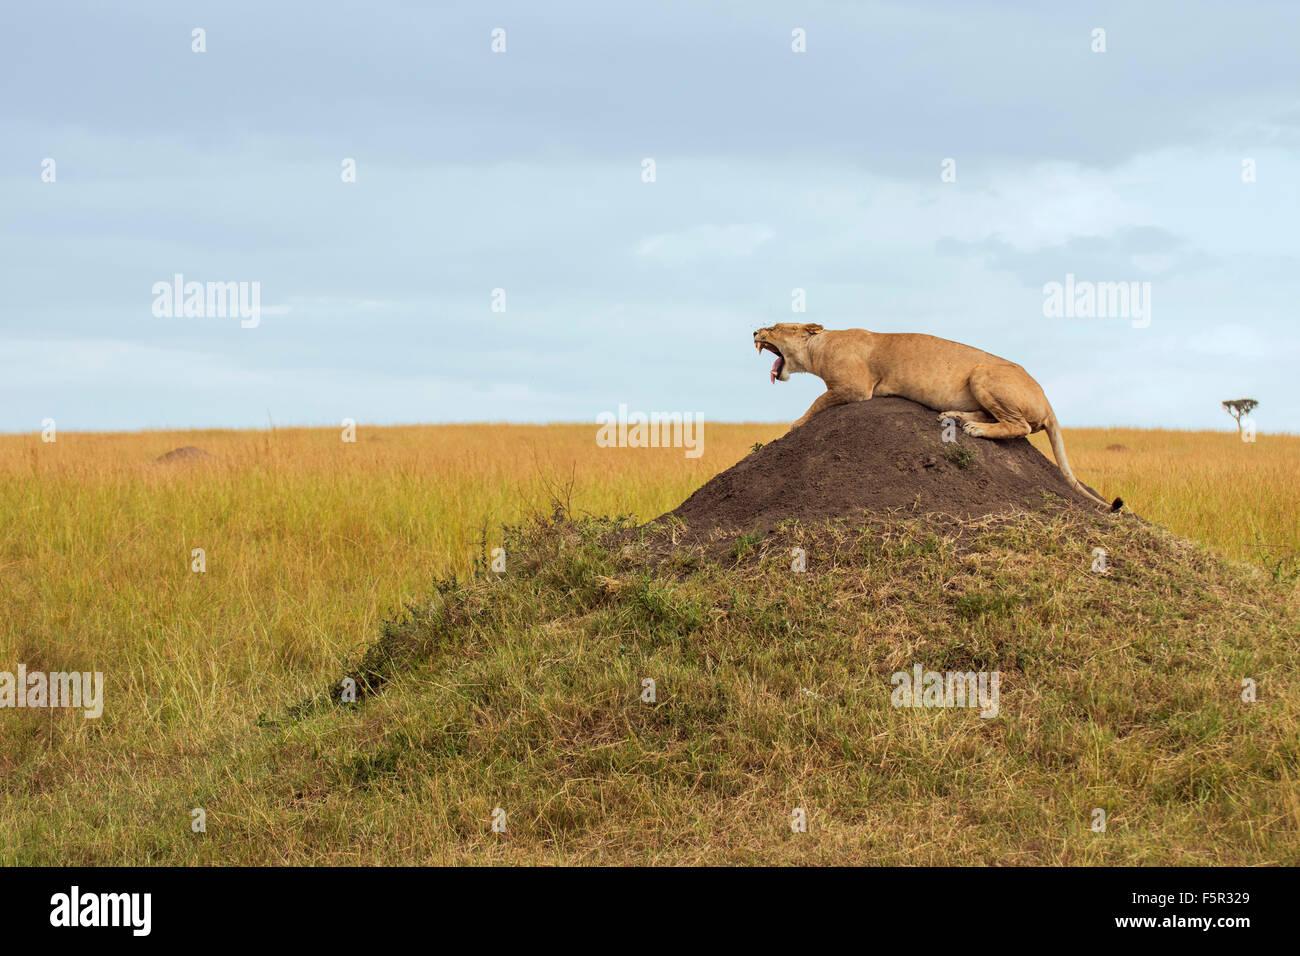 Lying Under the Mound